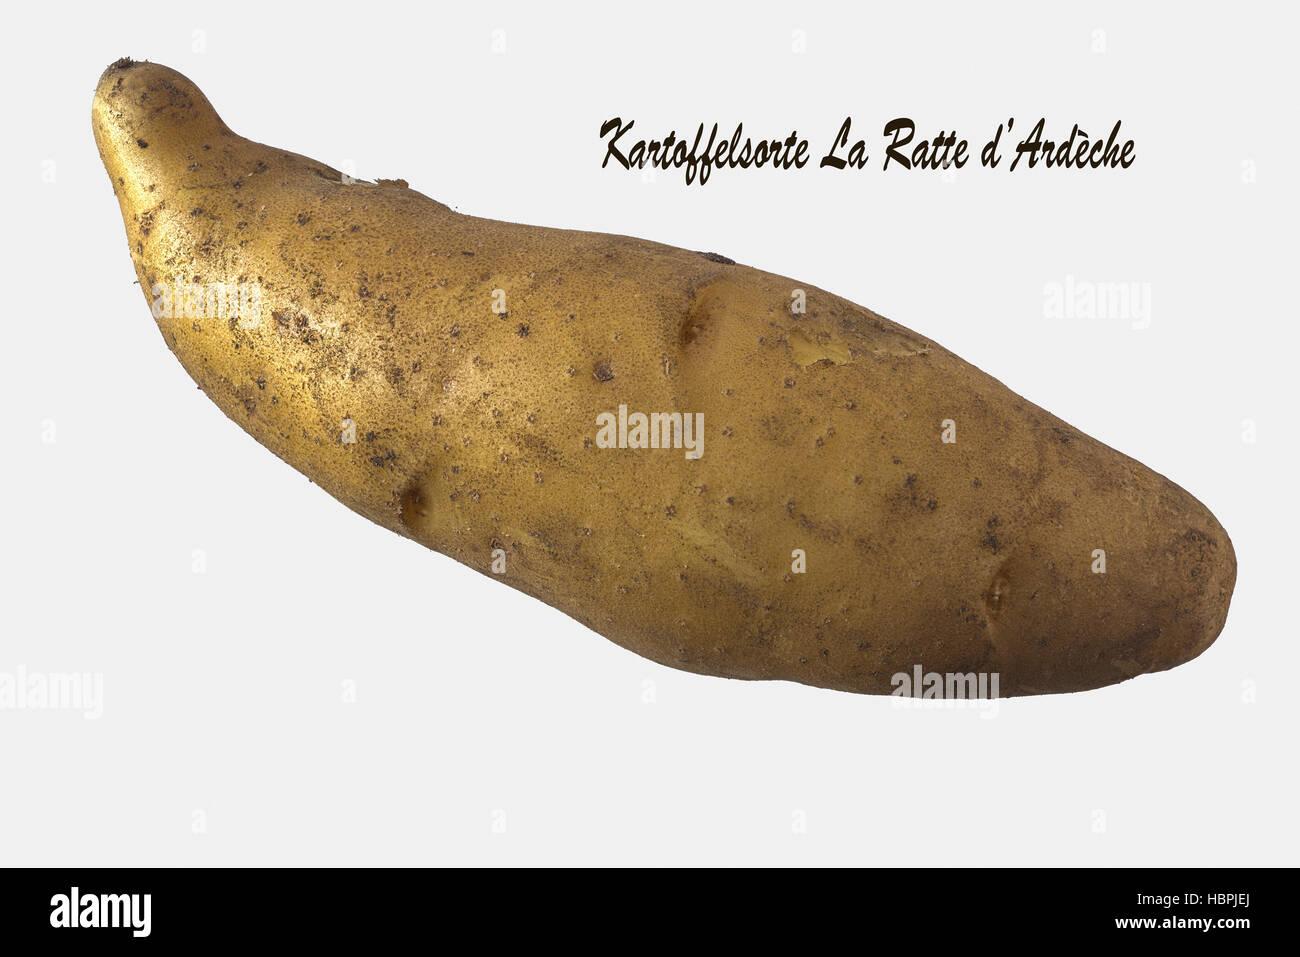 Ratte Potato, Cut-out Stock Photo